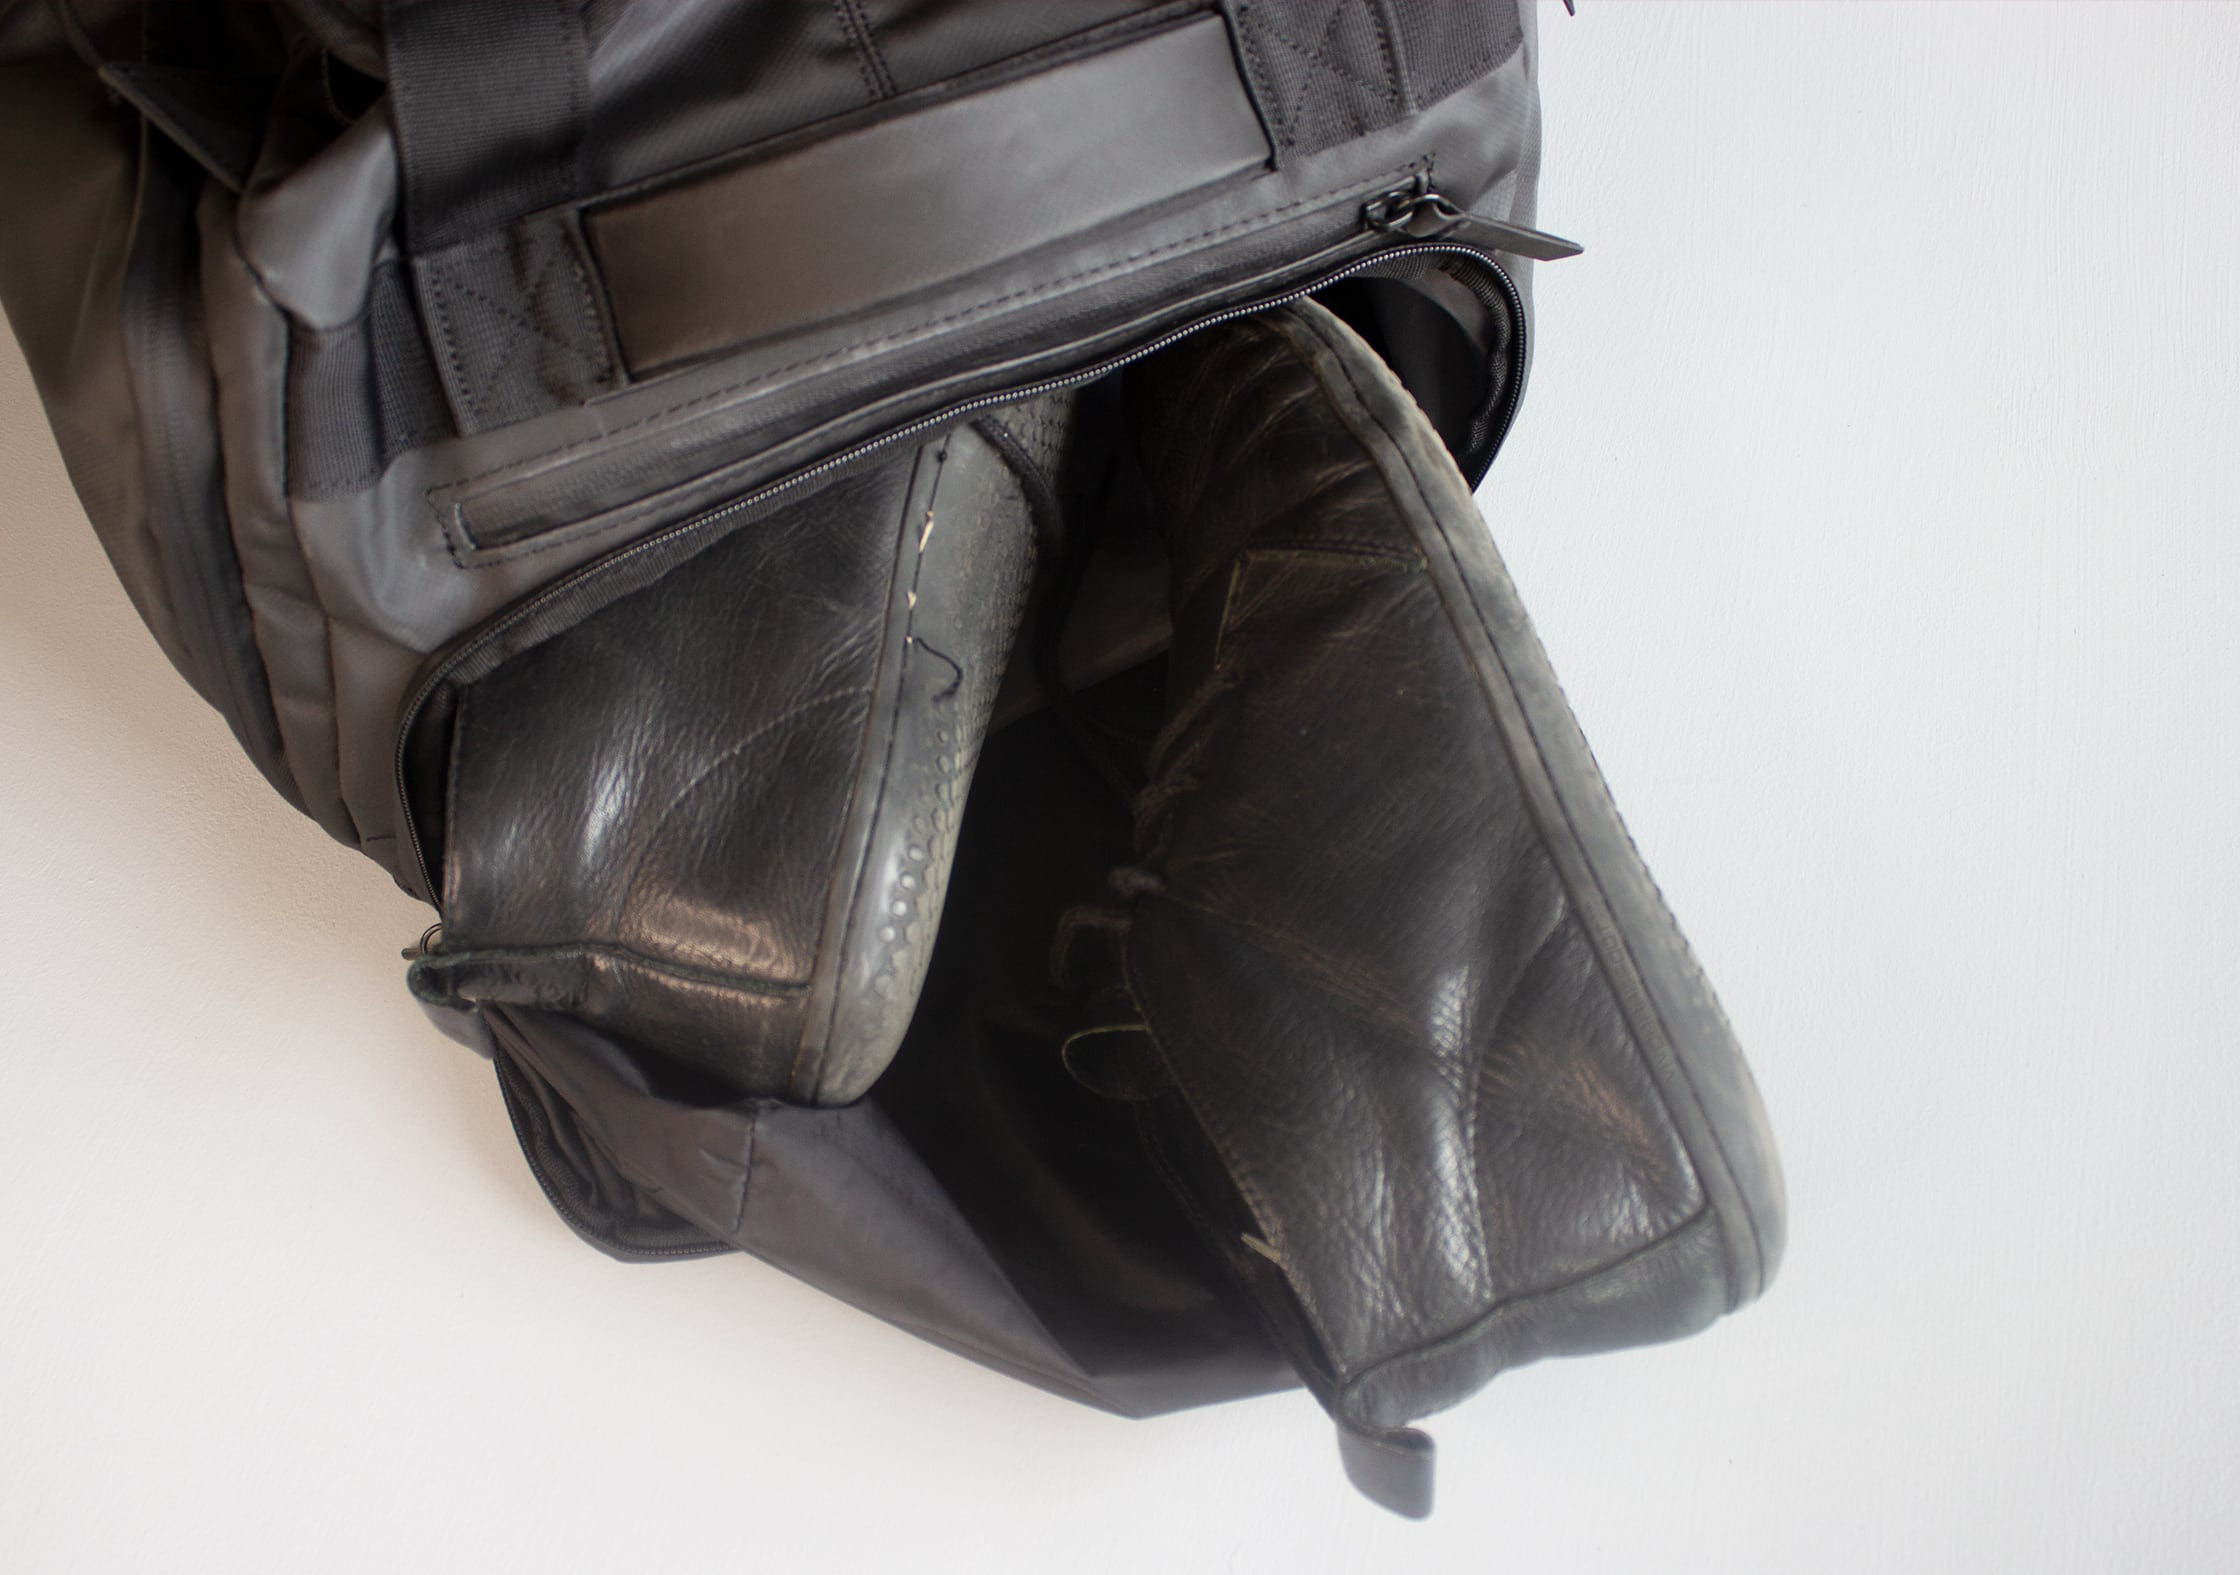 NOMATIC Travel Bag Shoe Compartment